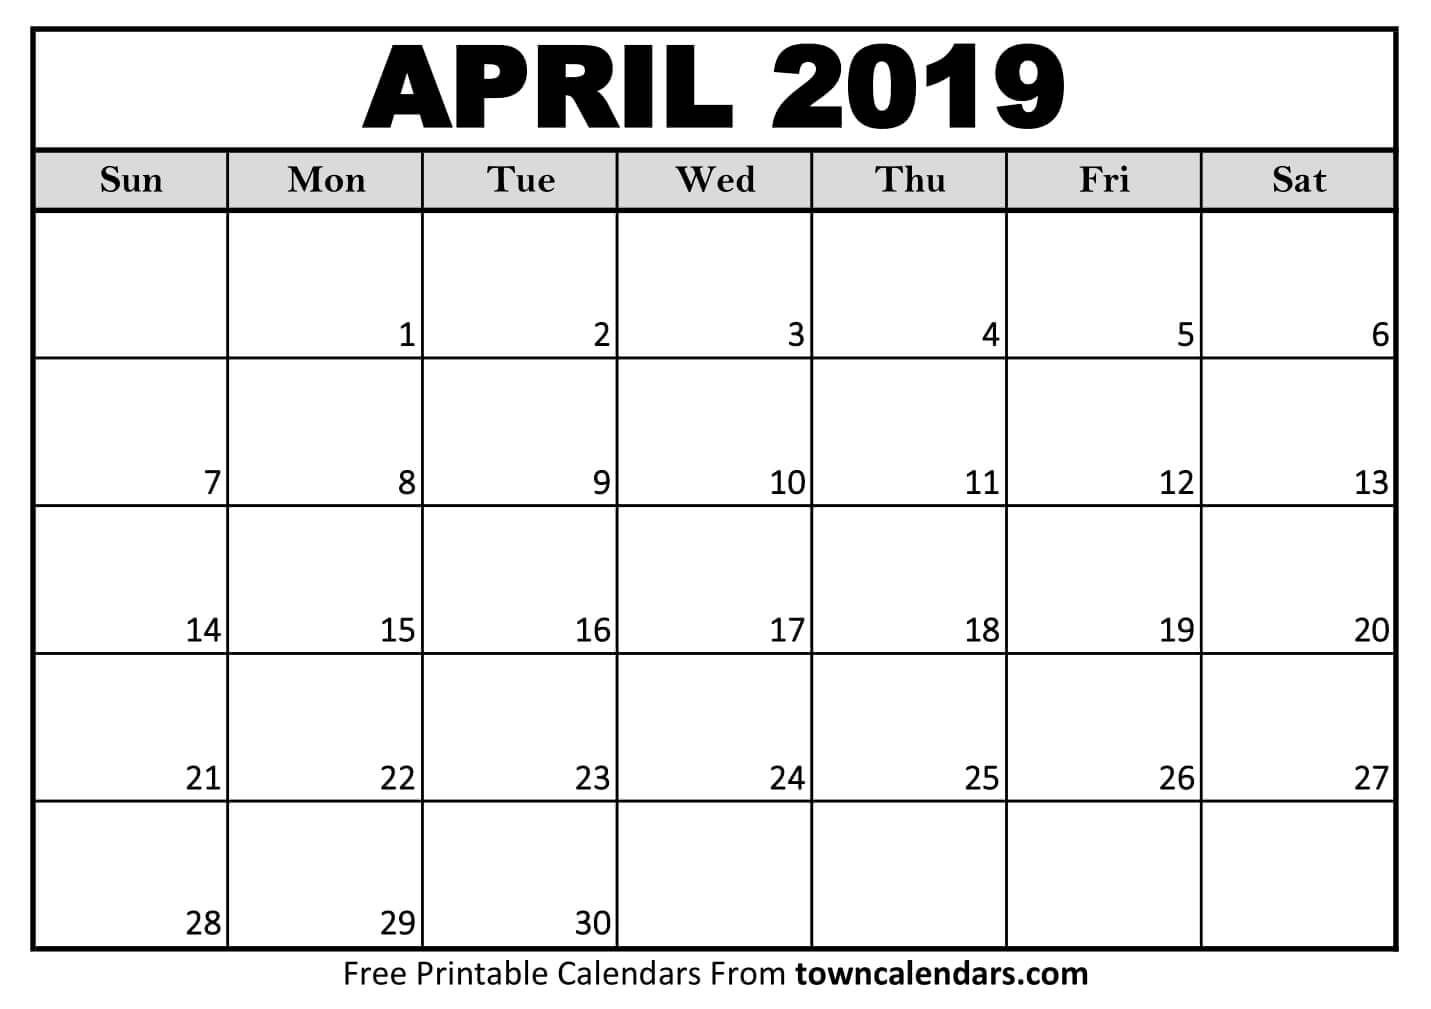 April 2019 Calendar Printable Template Editable Blank Pdf Word